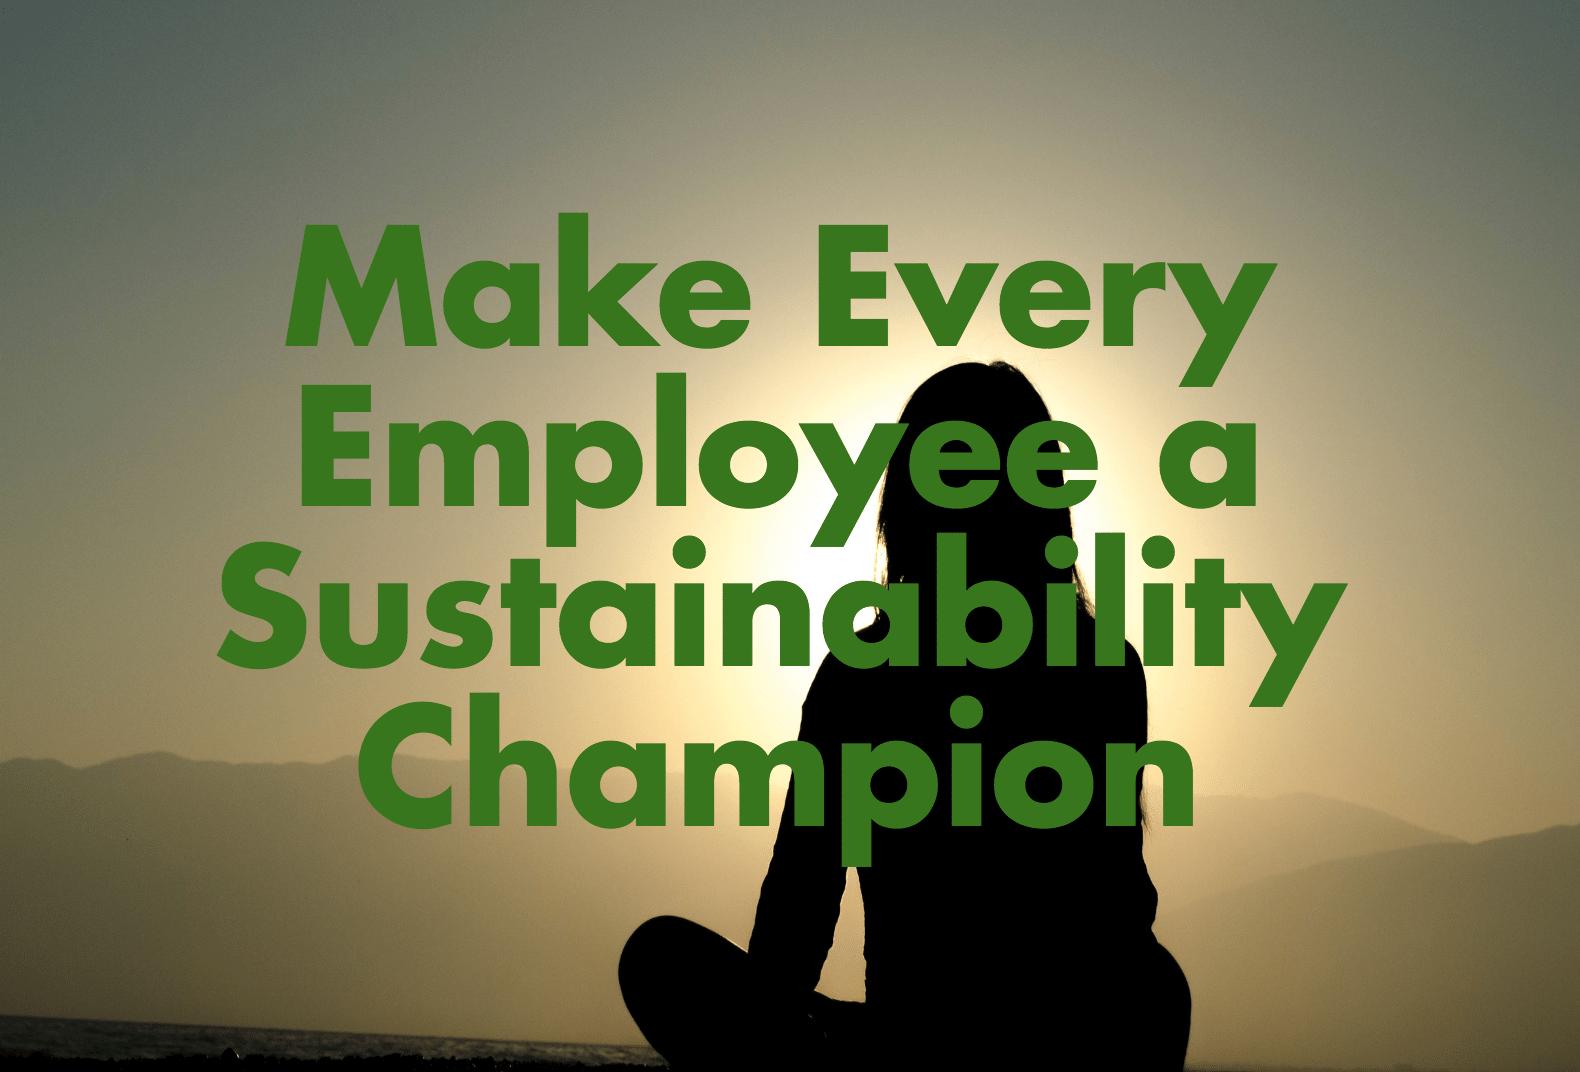 Make every employee a sustainability champion